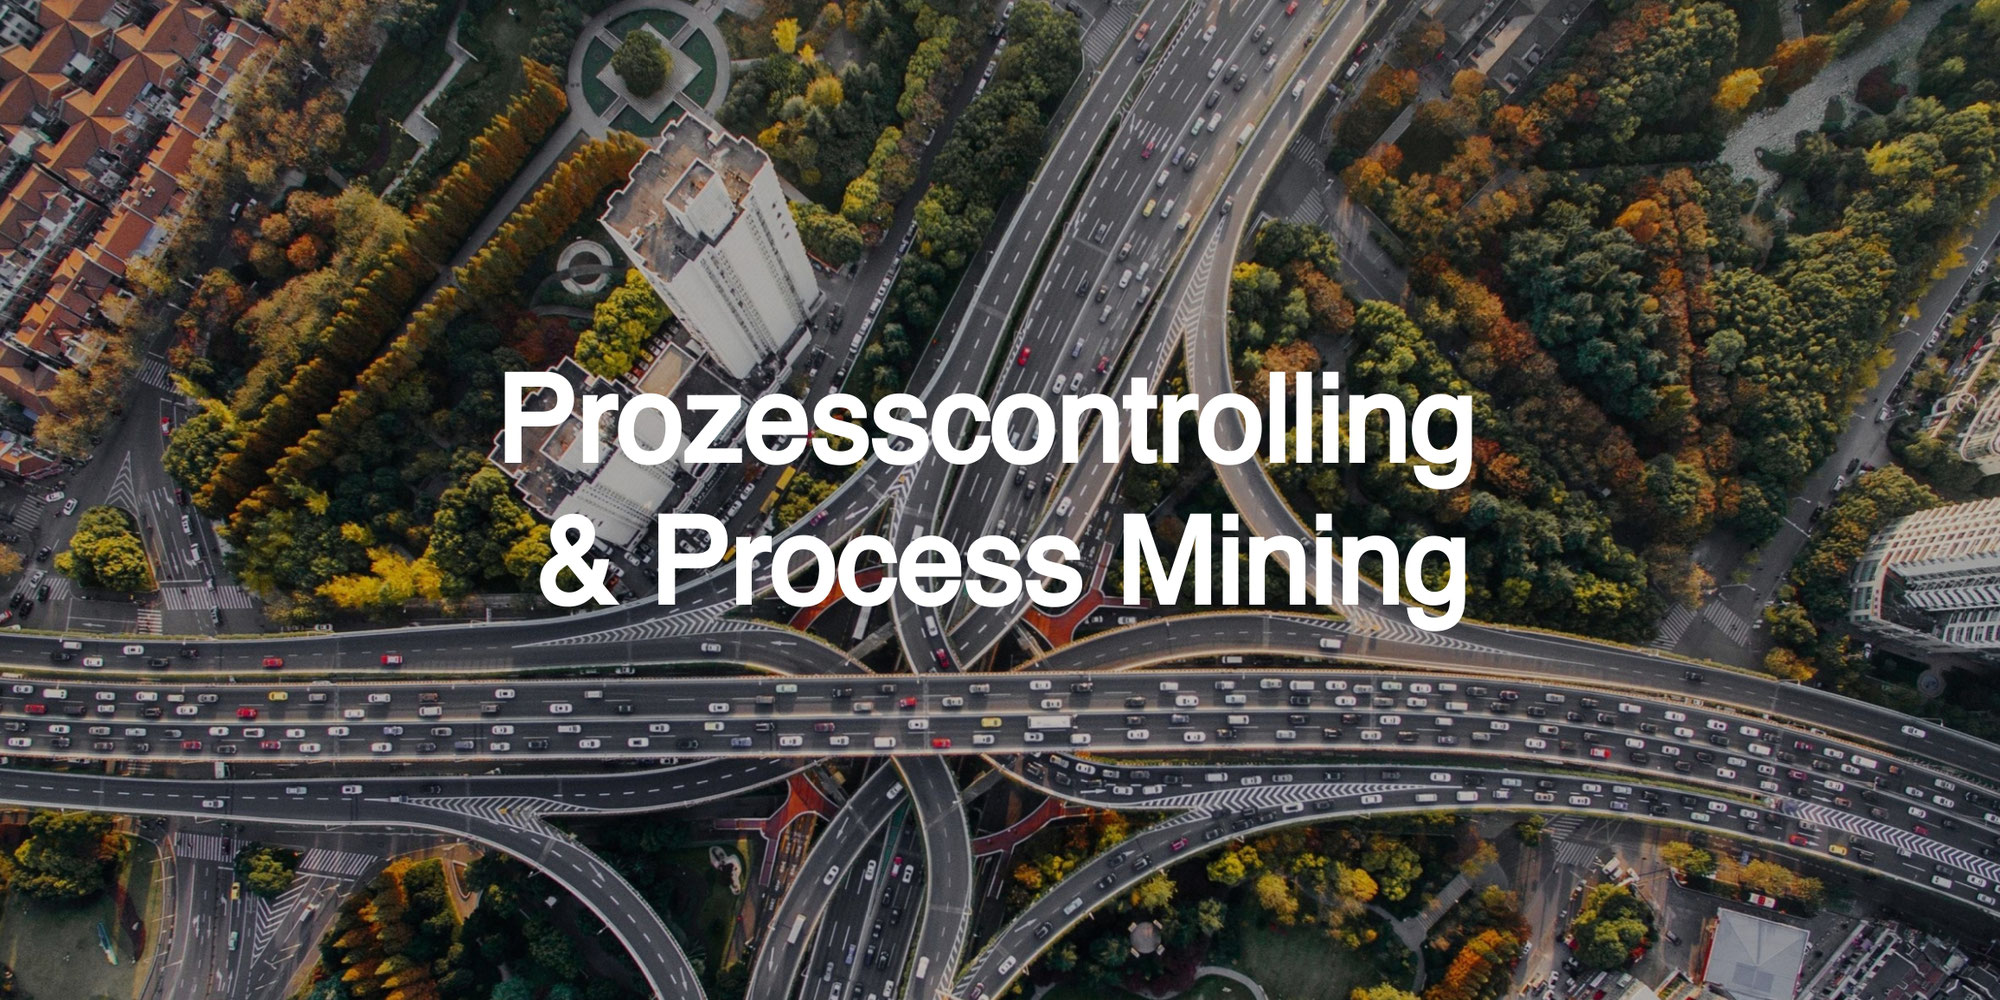 Prozesscontrolling & Process Mining